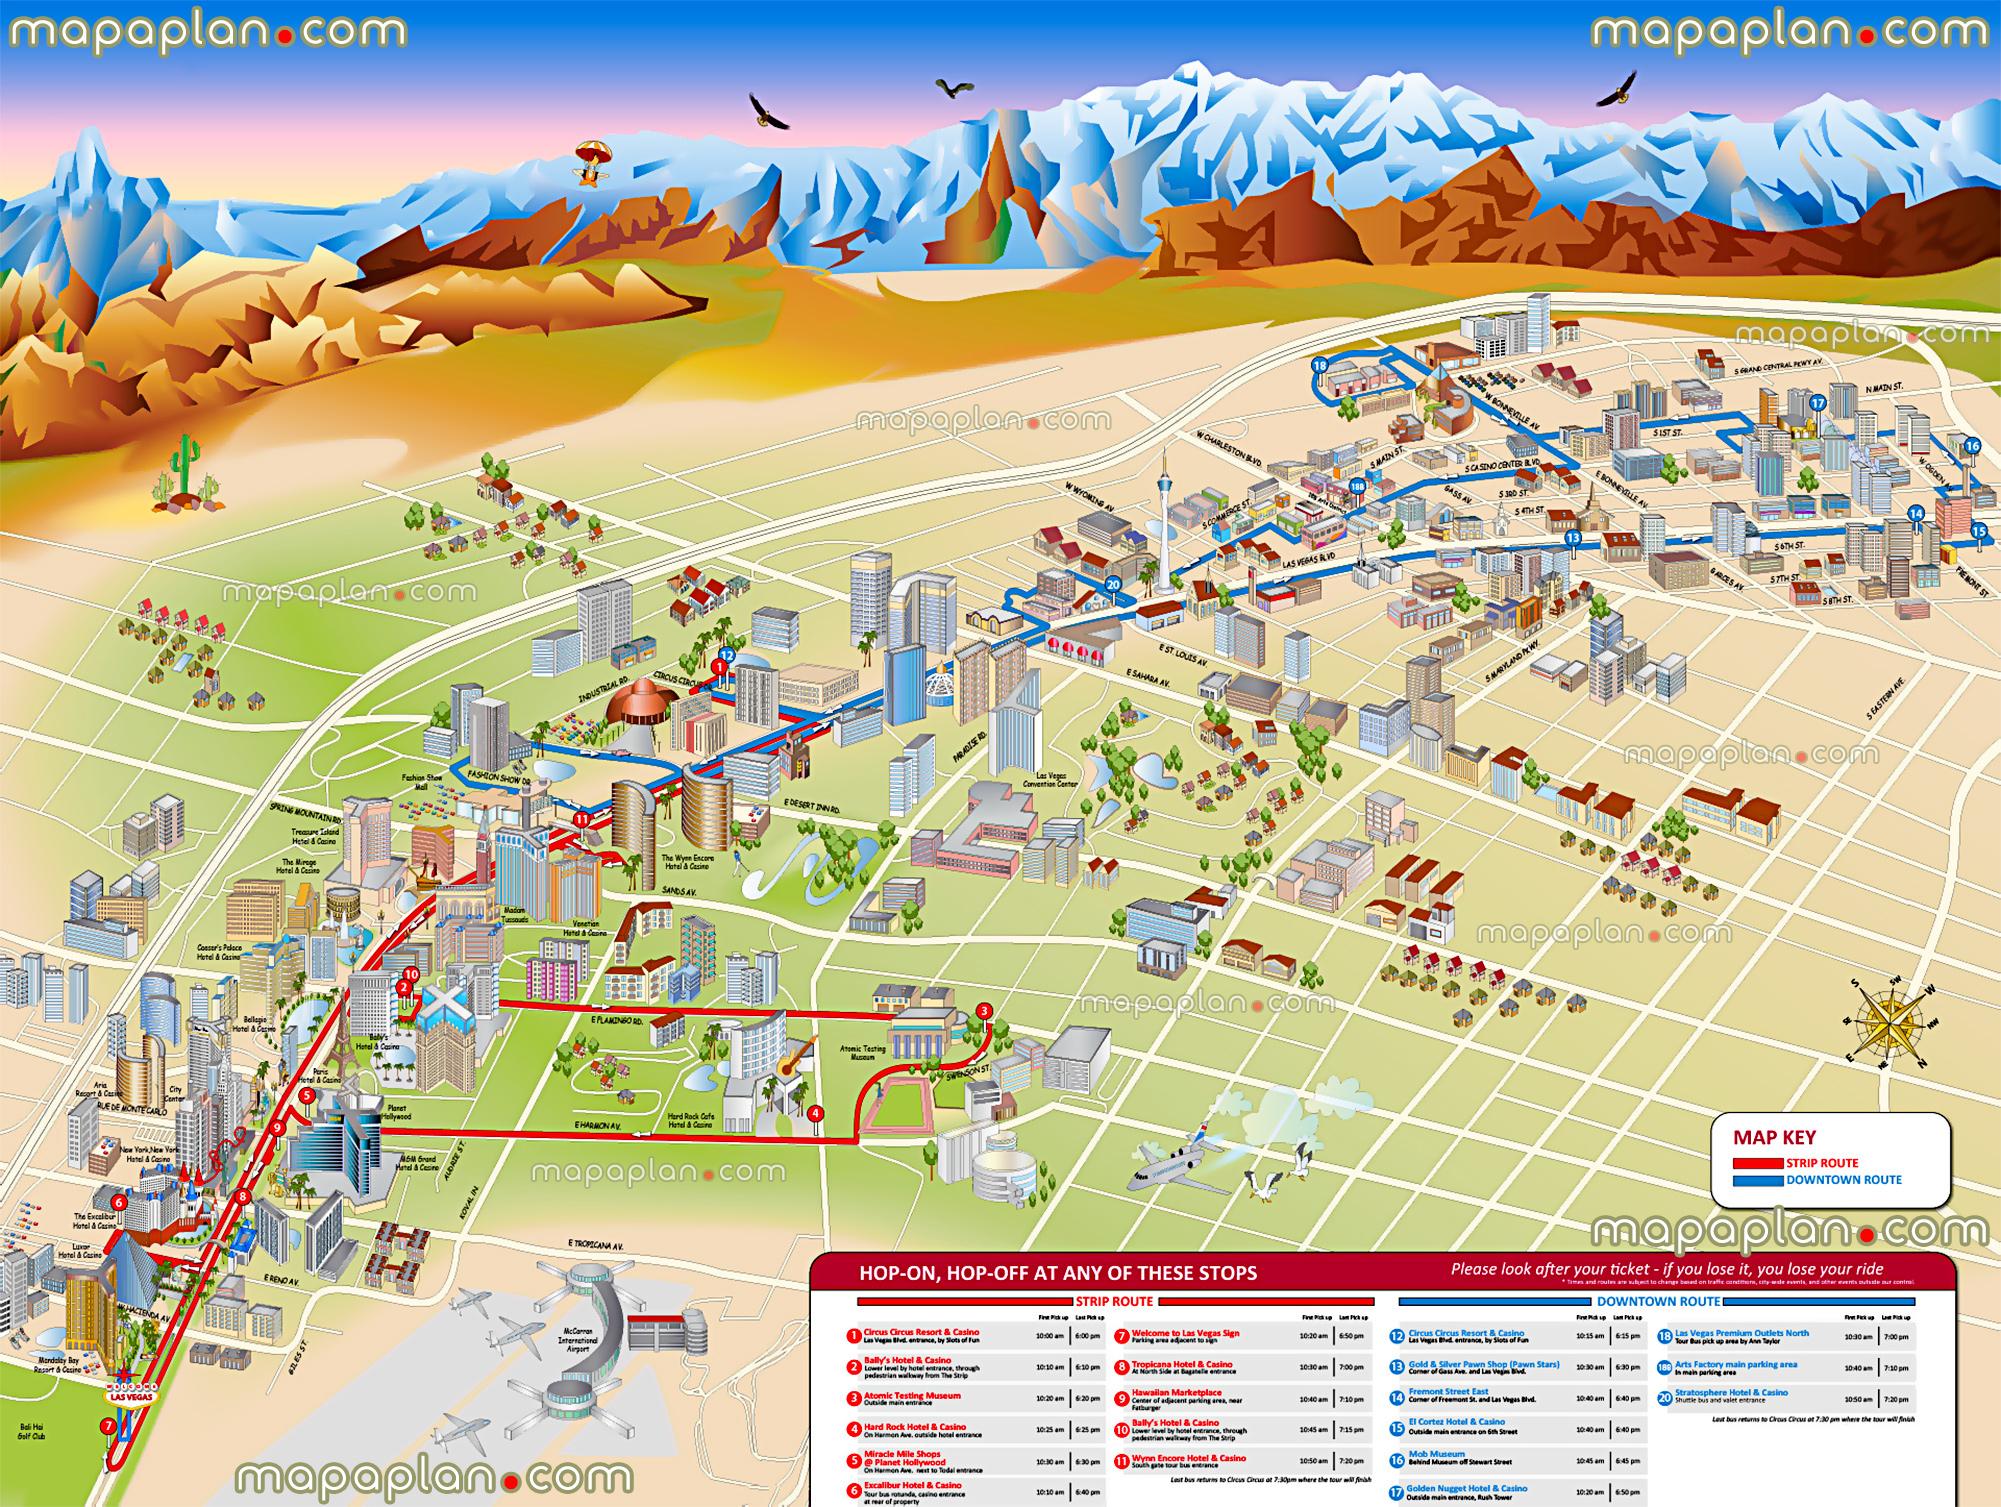 Las Vegas Maps - Top Tourist Attractions - Free, Printable City - Printable Las Vegas Street Maps